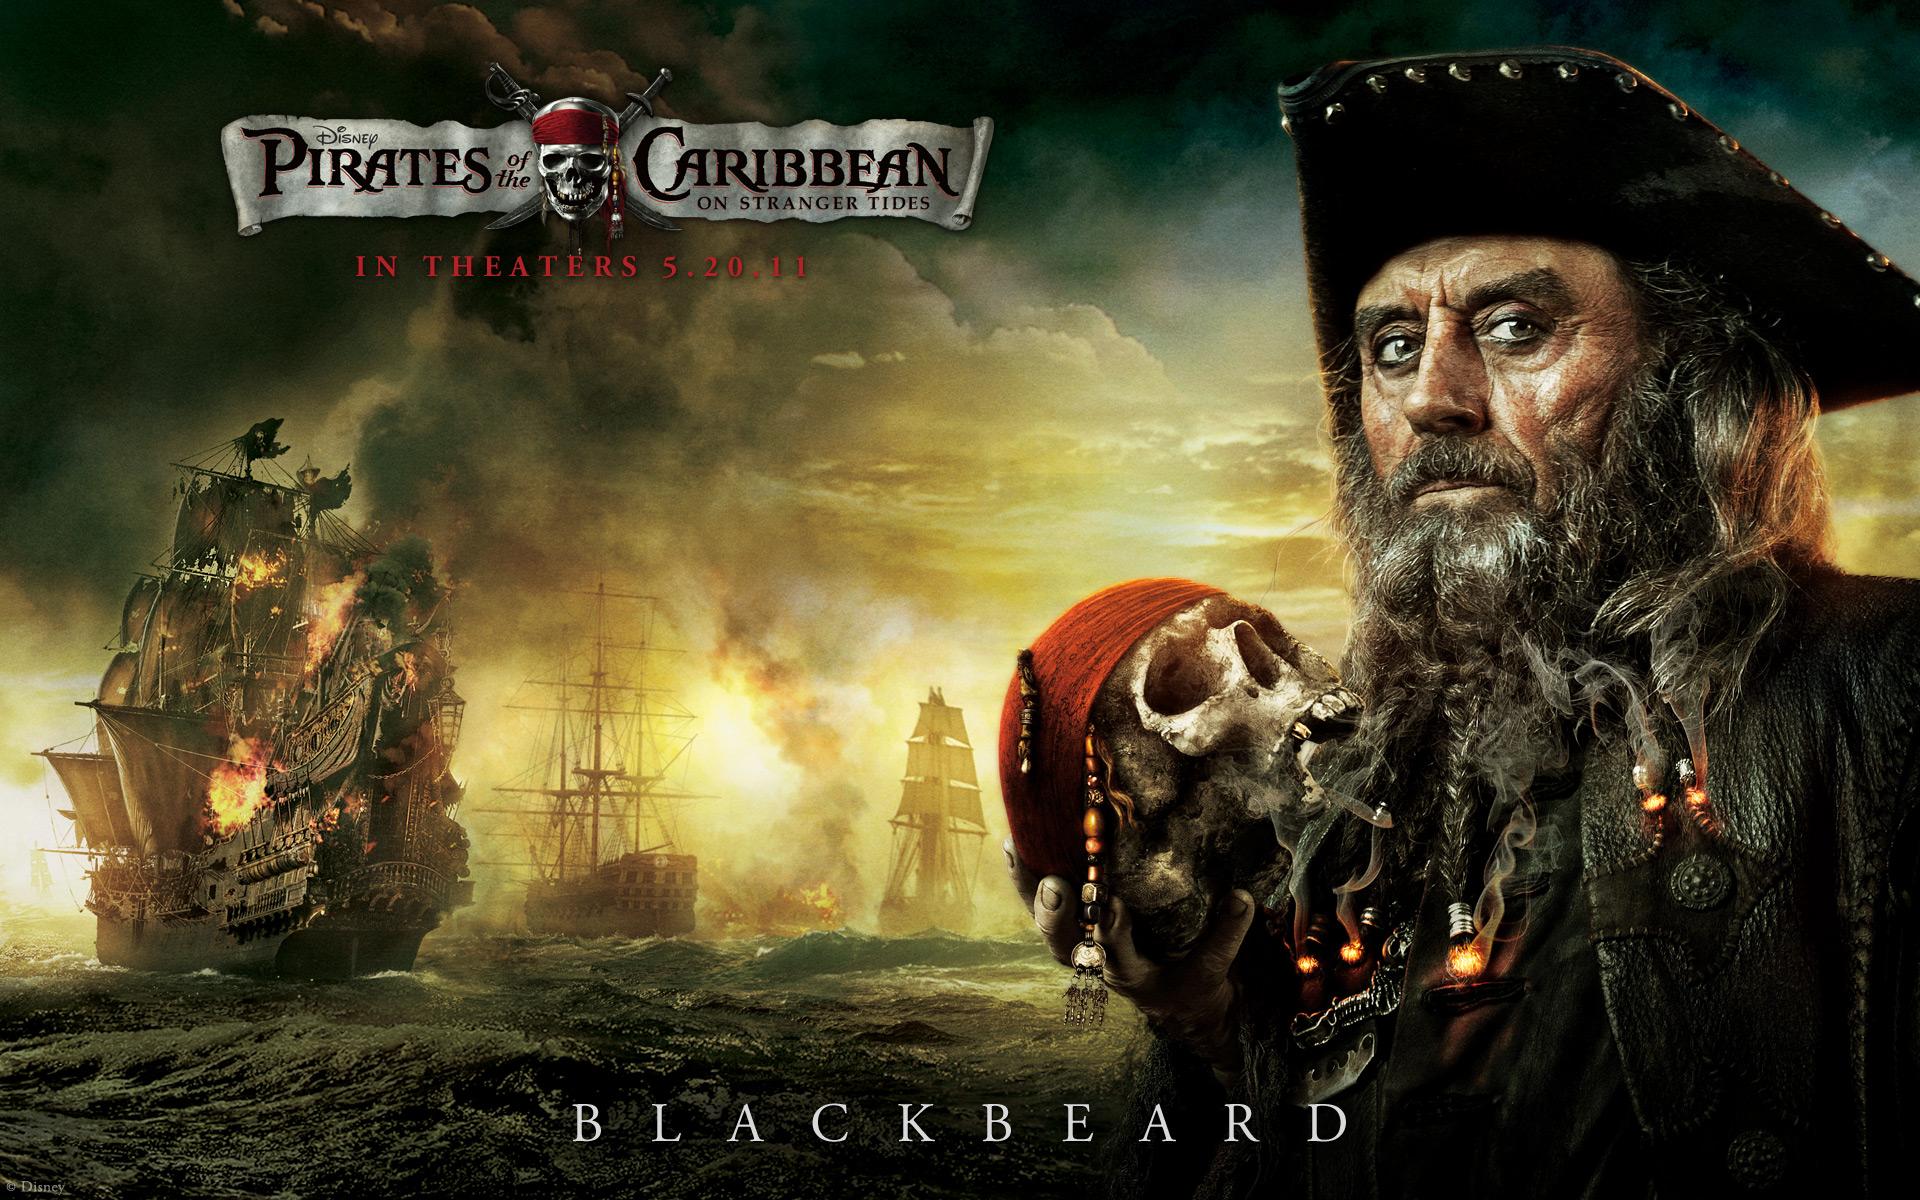 Blackbeard From Pirates Of The Caribbean Desktop Wallpaper